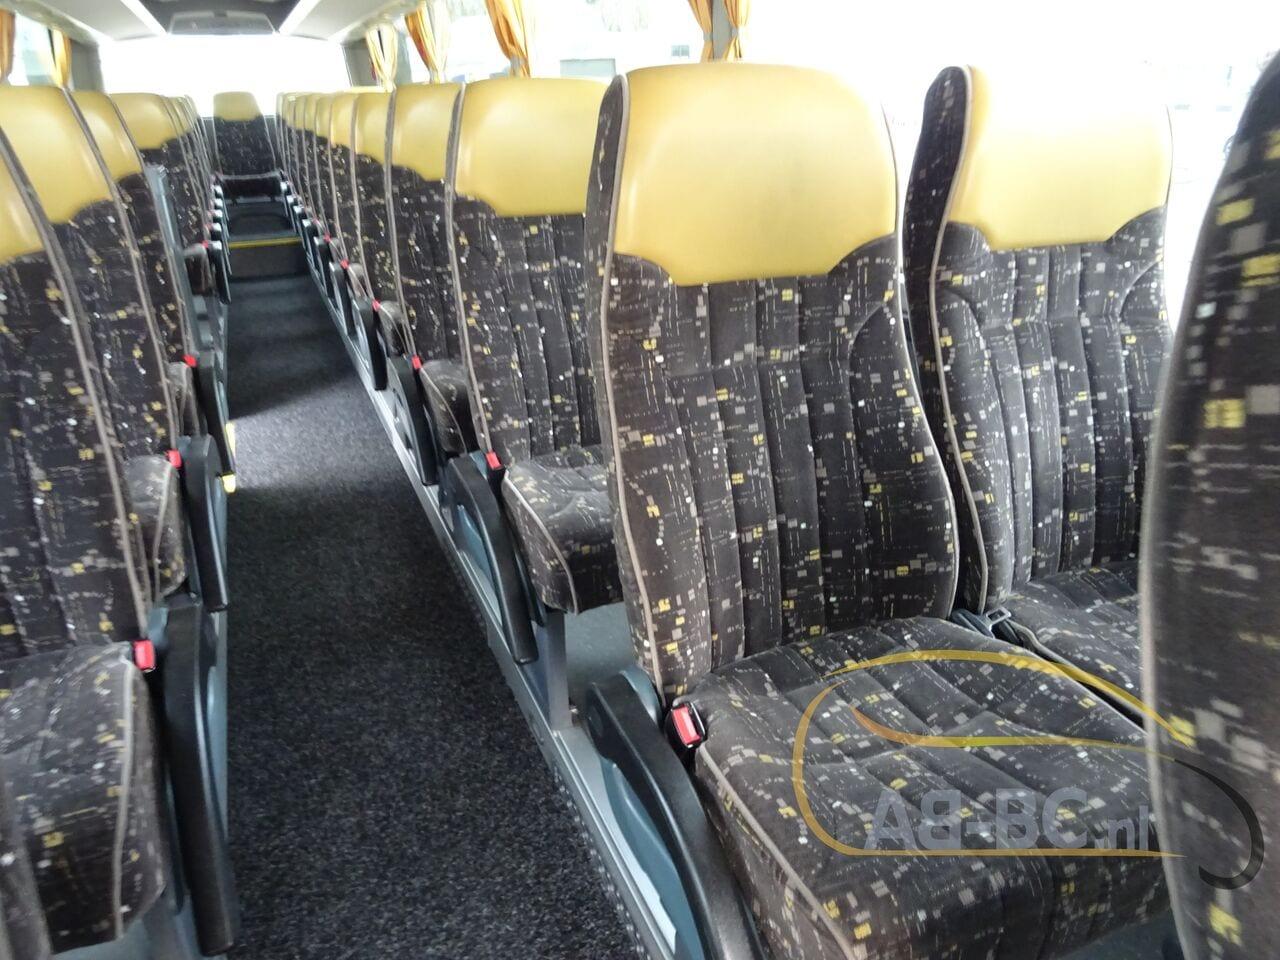 coach-busTEMSA-Safari-HD-51-Seats-EURO5-12-MTR---1614266606125685784_big_25be4371871c5b0fb564b5d12b22a023--19052917224730818200